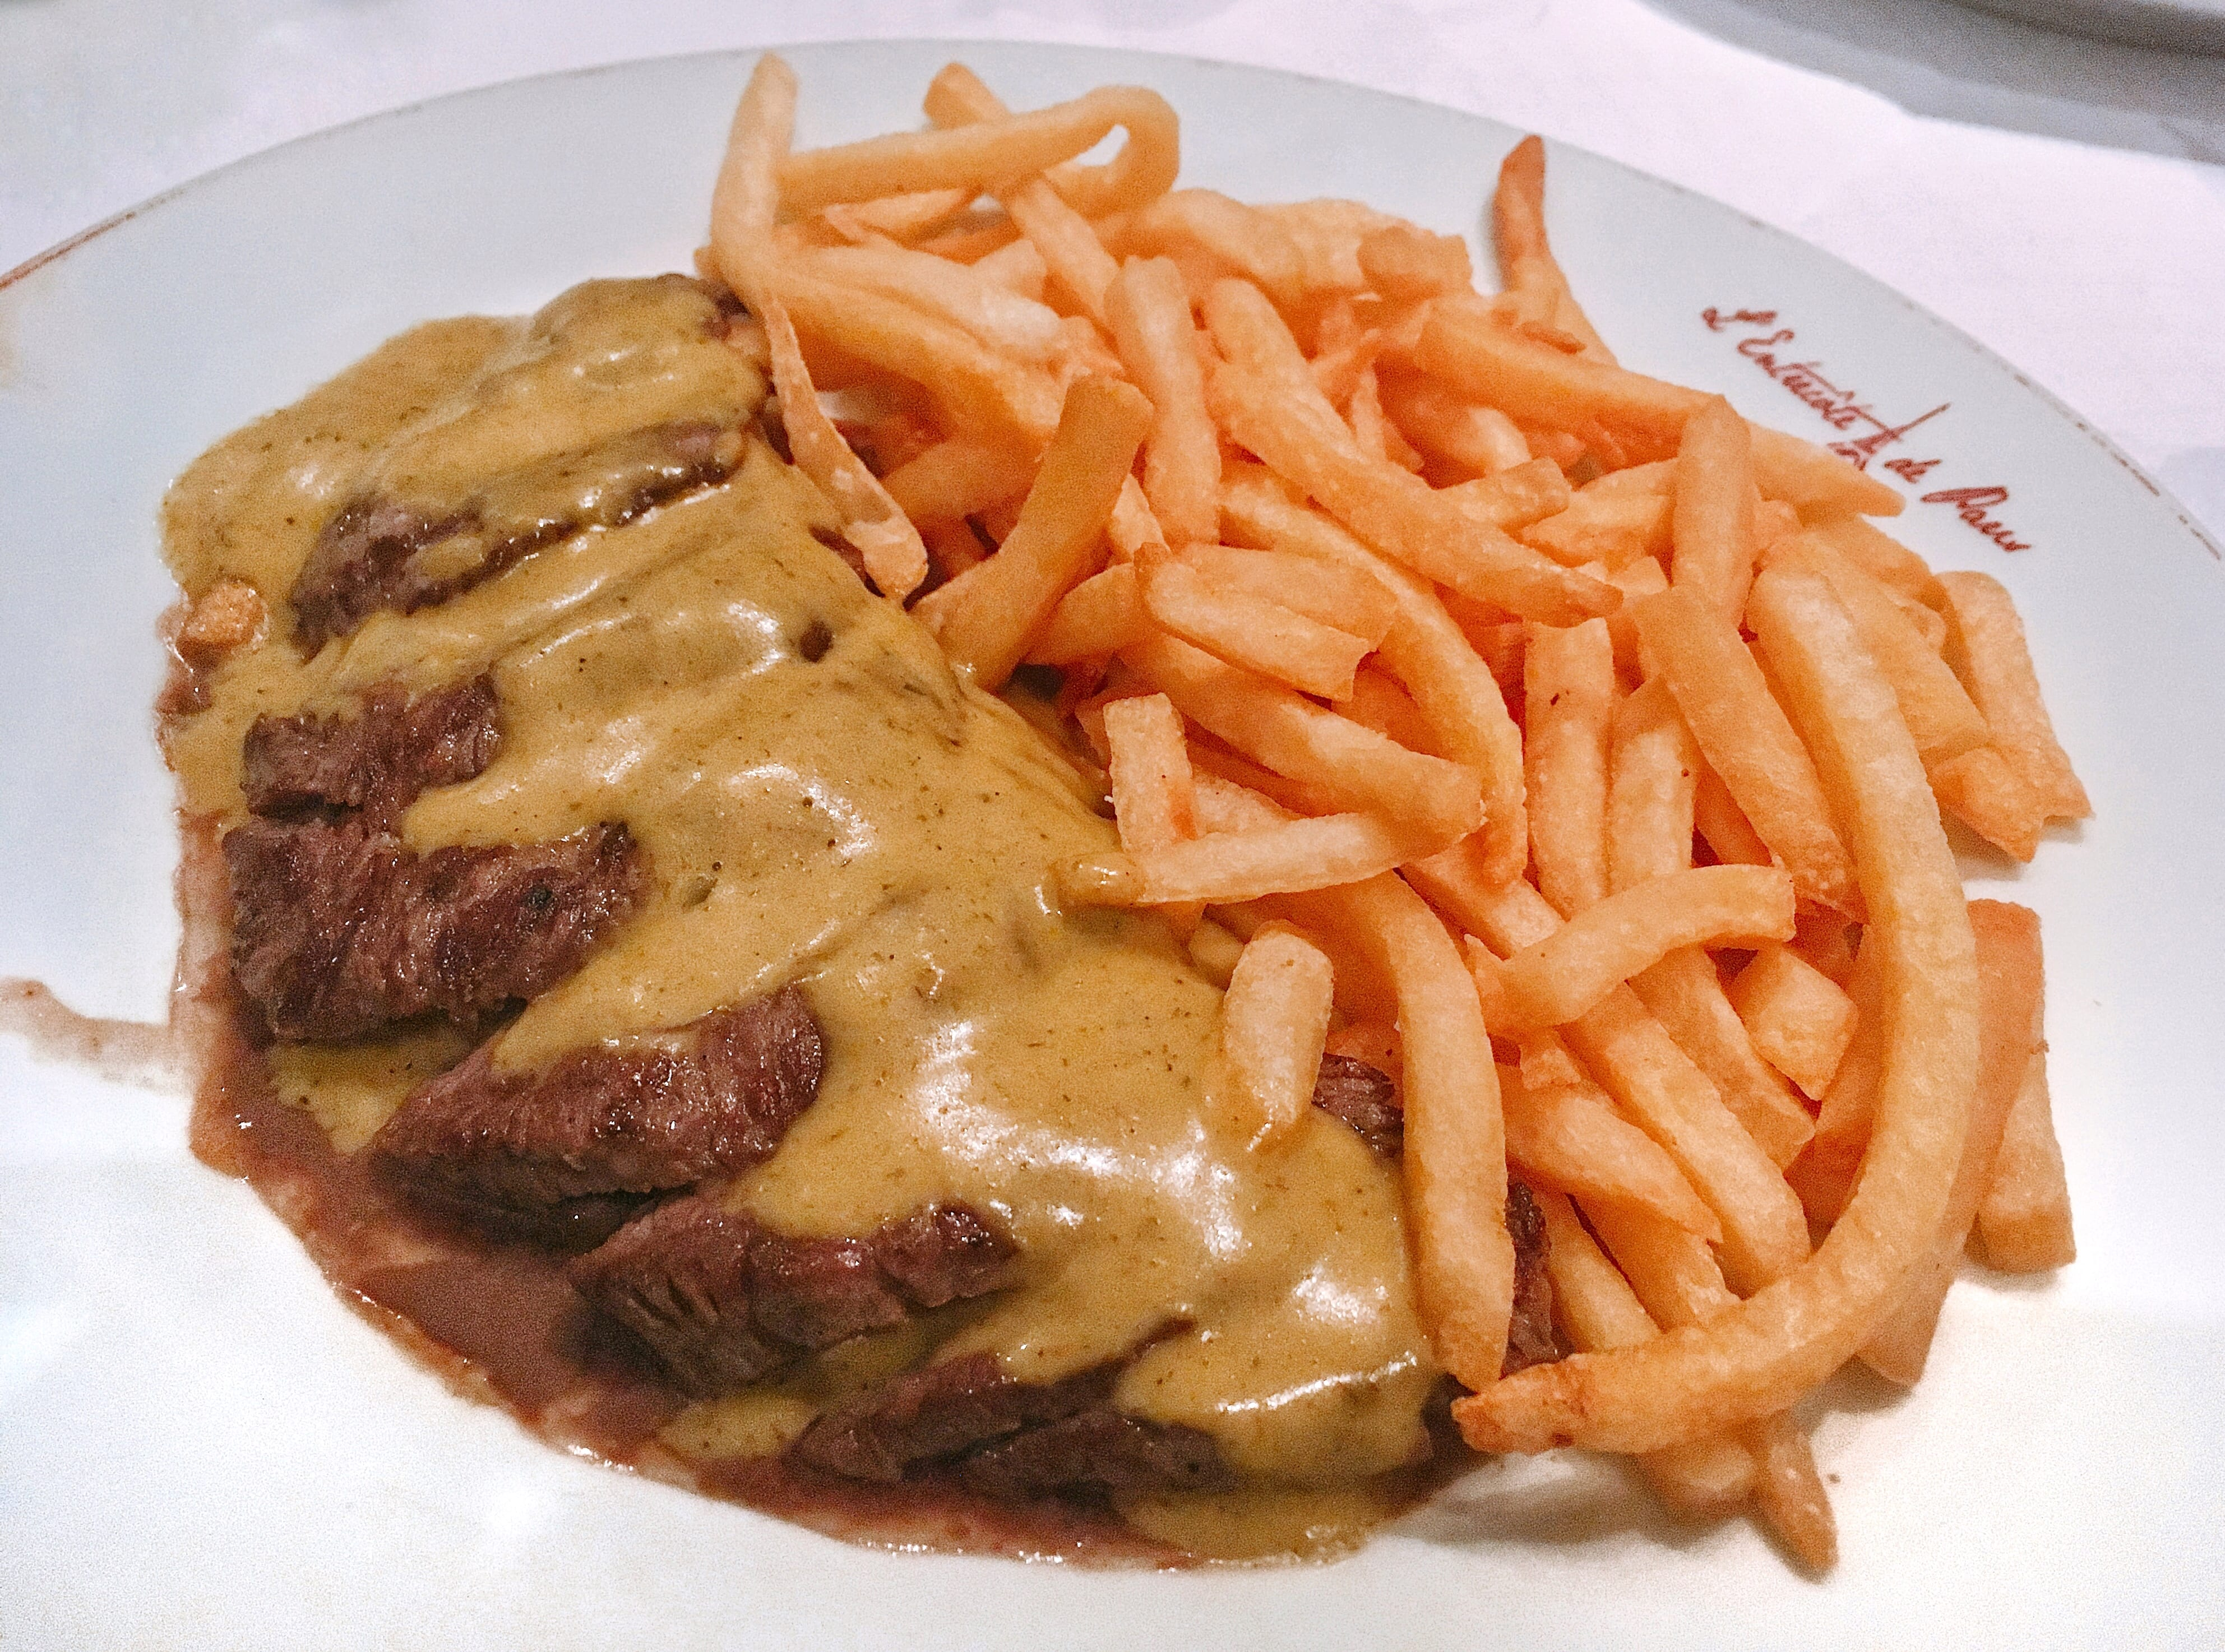 L'Entrecôte de Paris – O restaurante de um só prato (delicioso)!